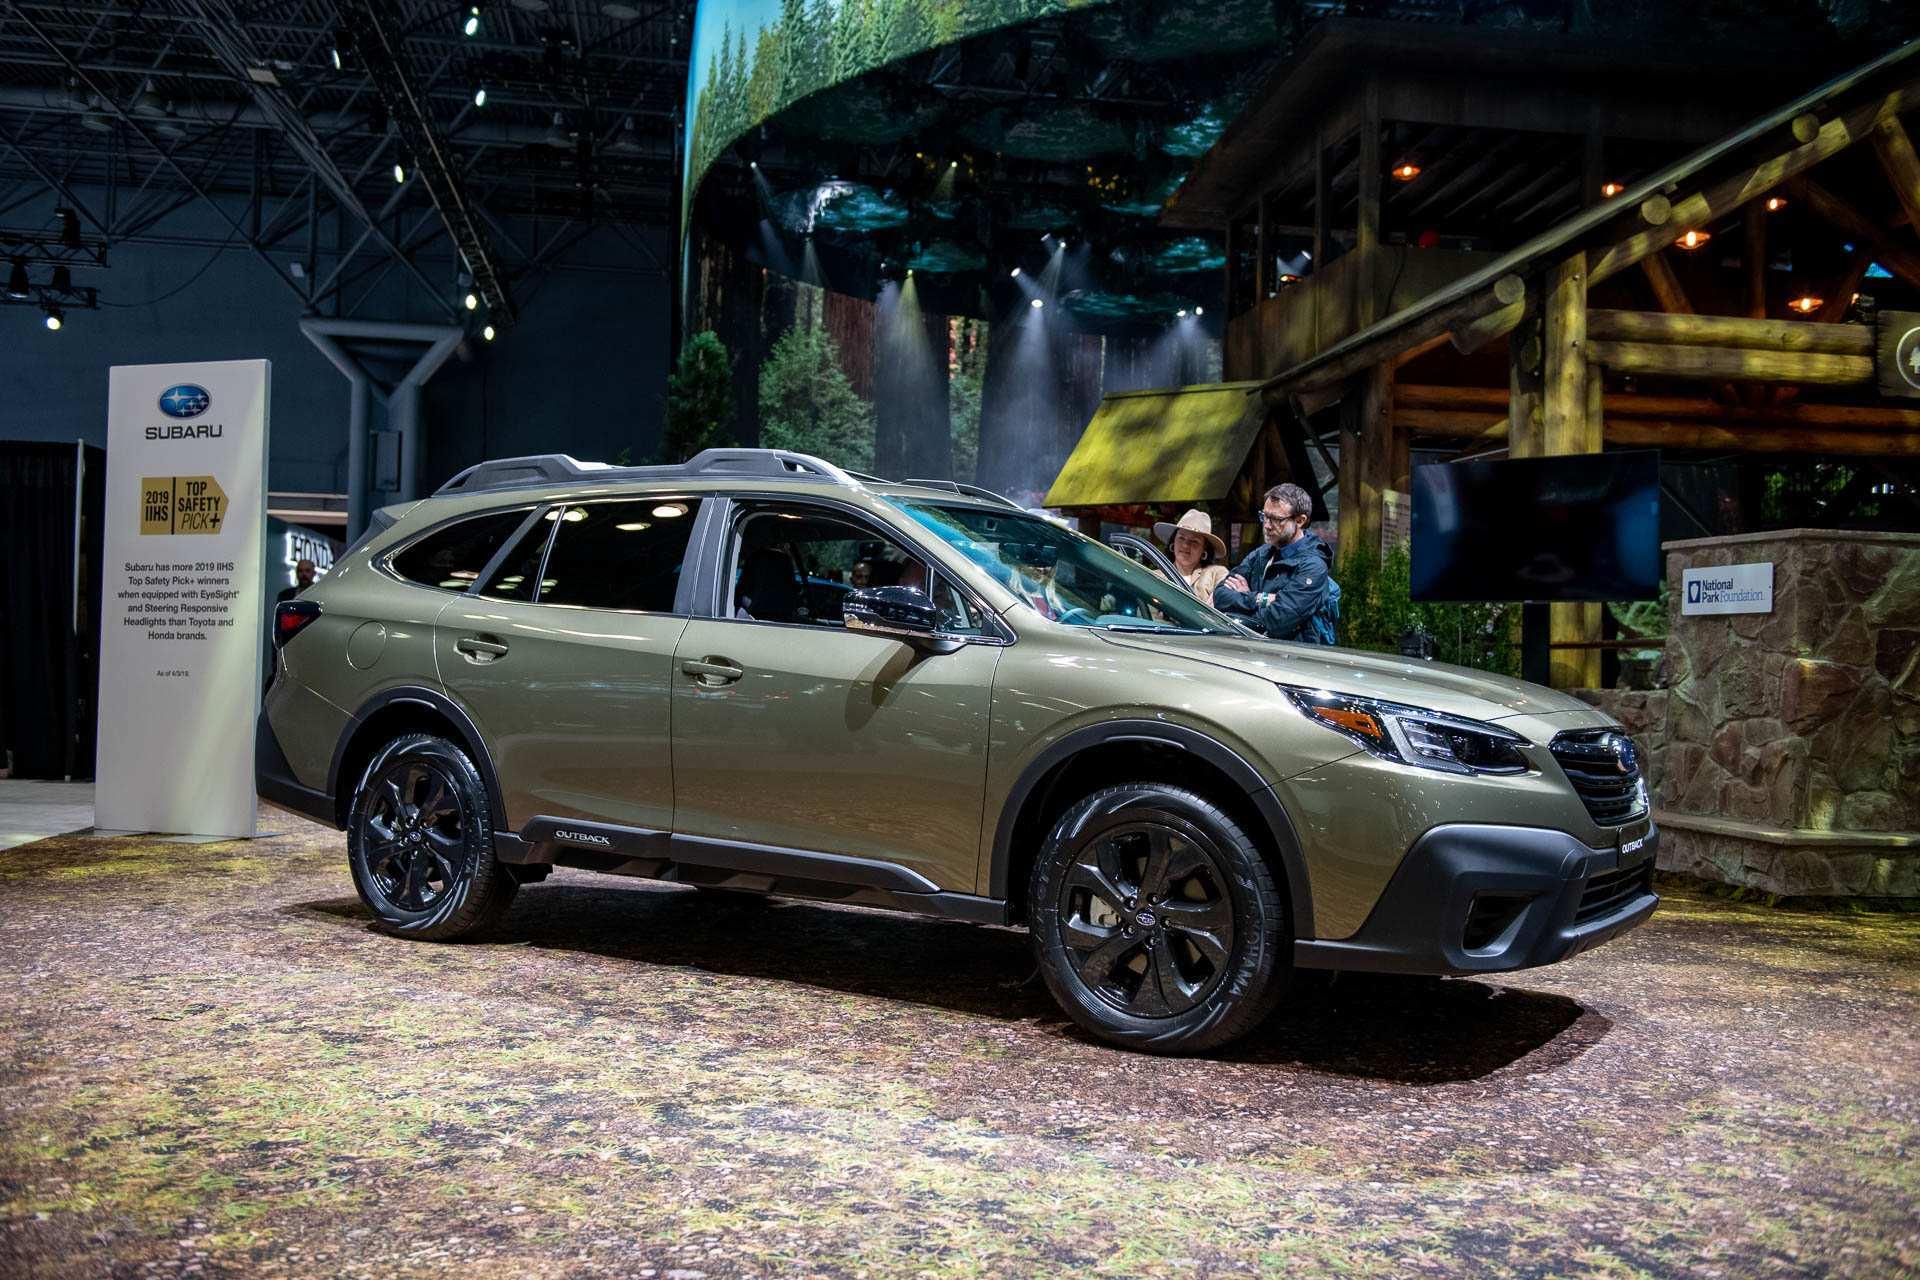 86 New Subaru Outback 2020 Release Date for Subaru Outback 2020